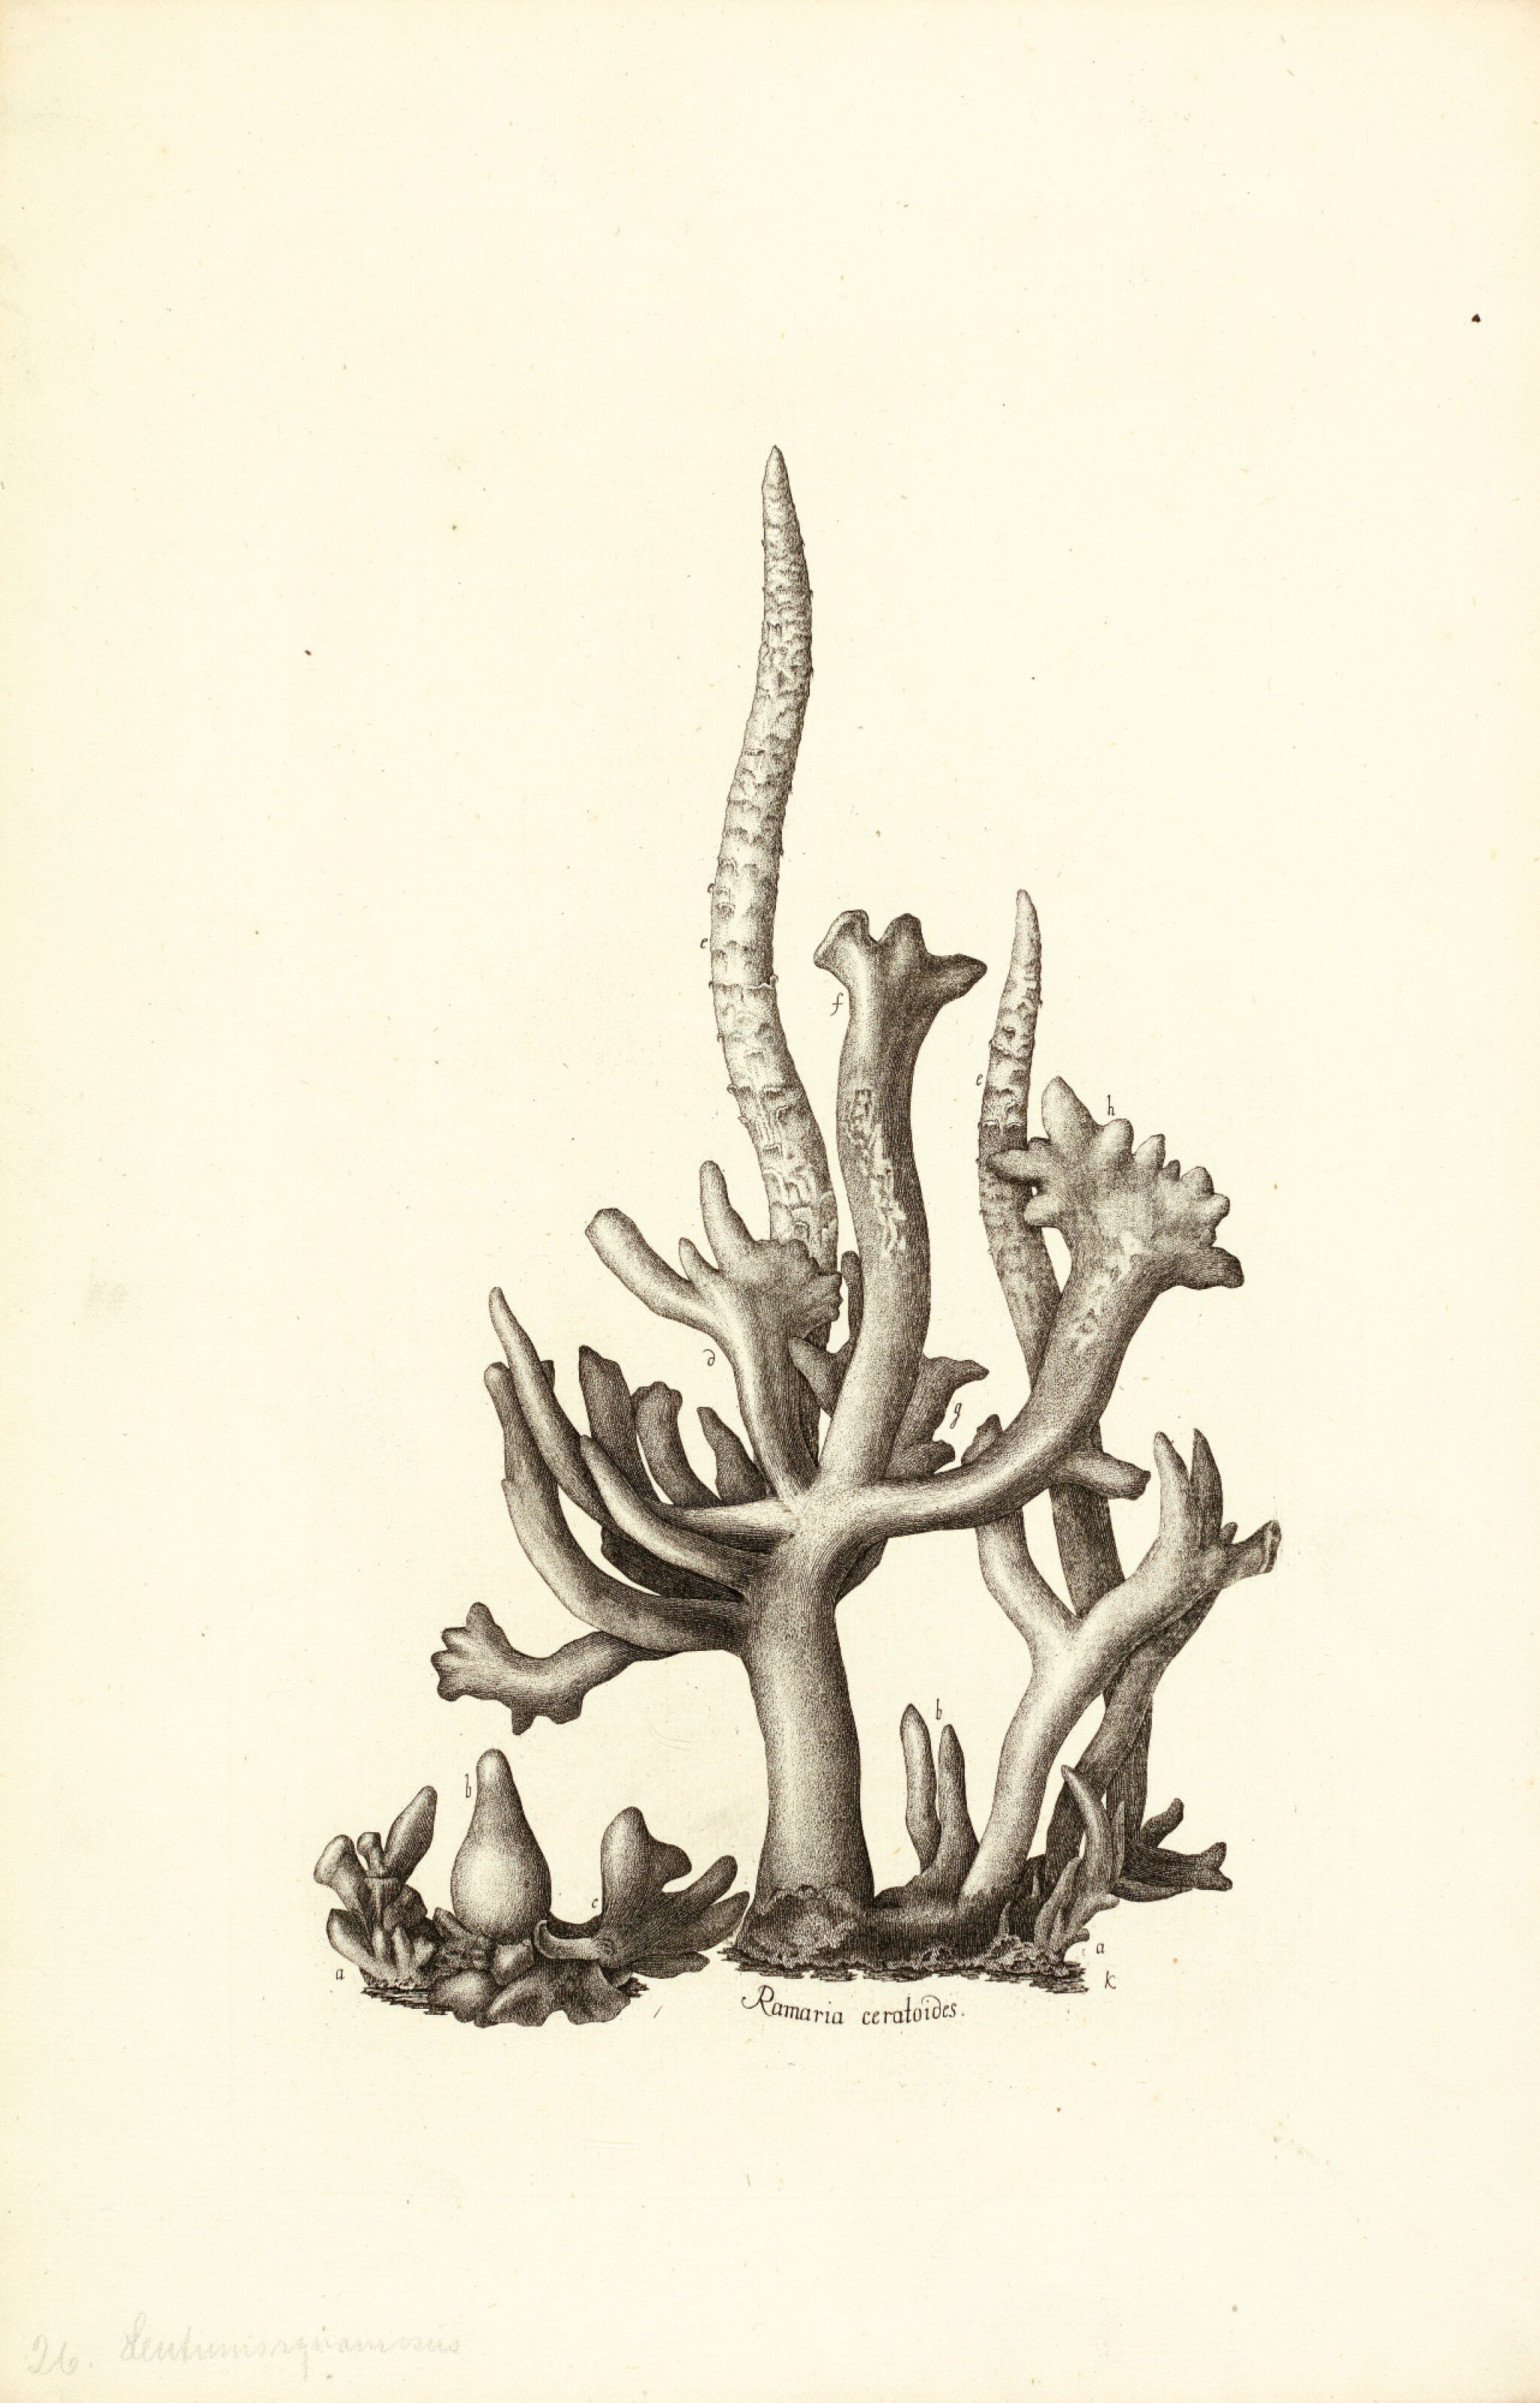 View full screen - View 1 of Lot 16. Holmskjold | Beata ruris fungis Danicis, [1790]-1799.